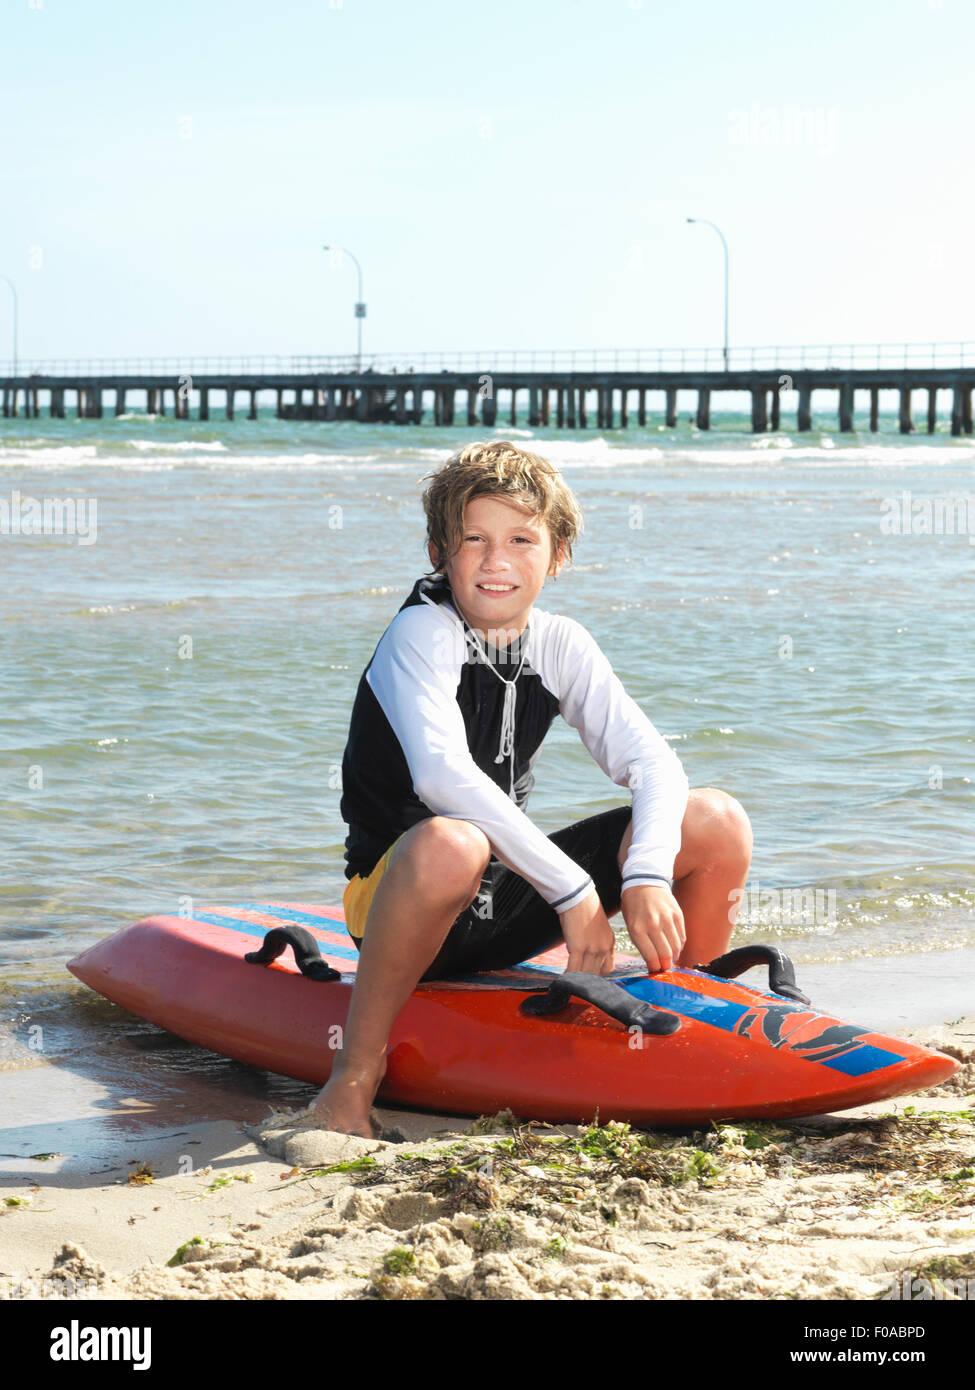 Portrait of boy nipper (child surf life savers) sitting on surfboard, Altona, Melbourne, Australia - Stock Image